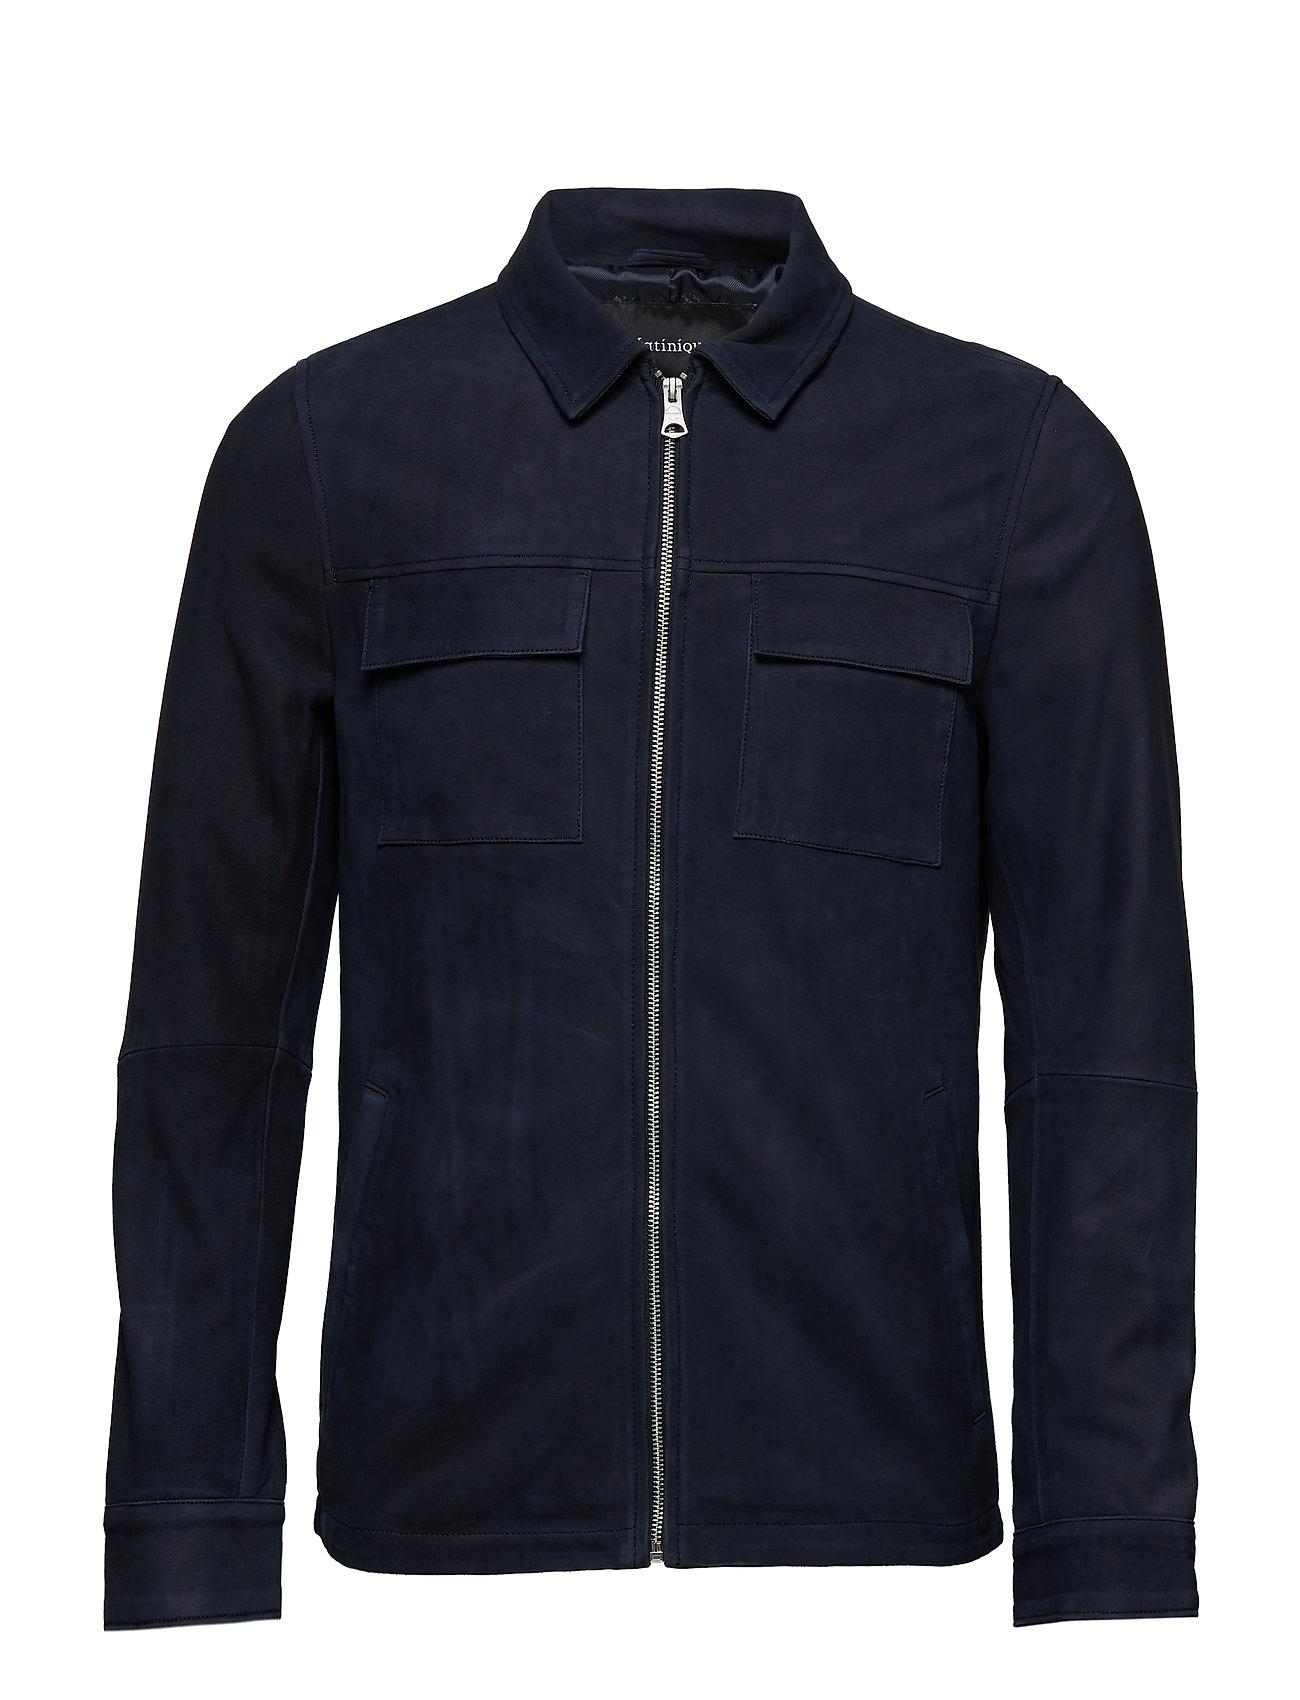 Matinique Runn Shirt Jacket - DARK NAVY